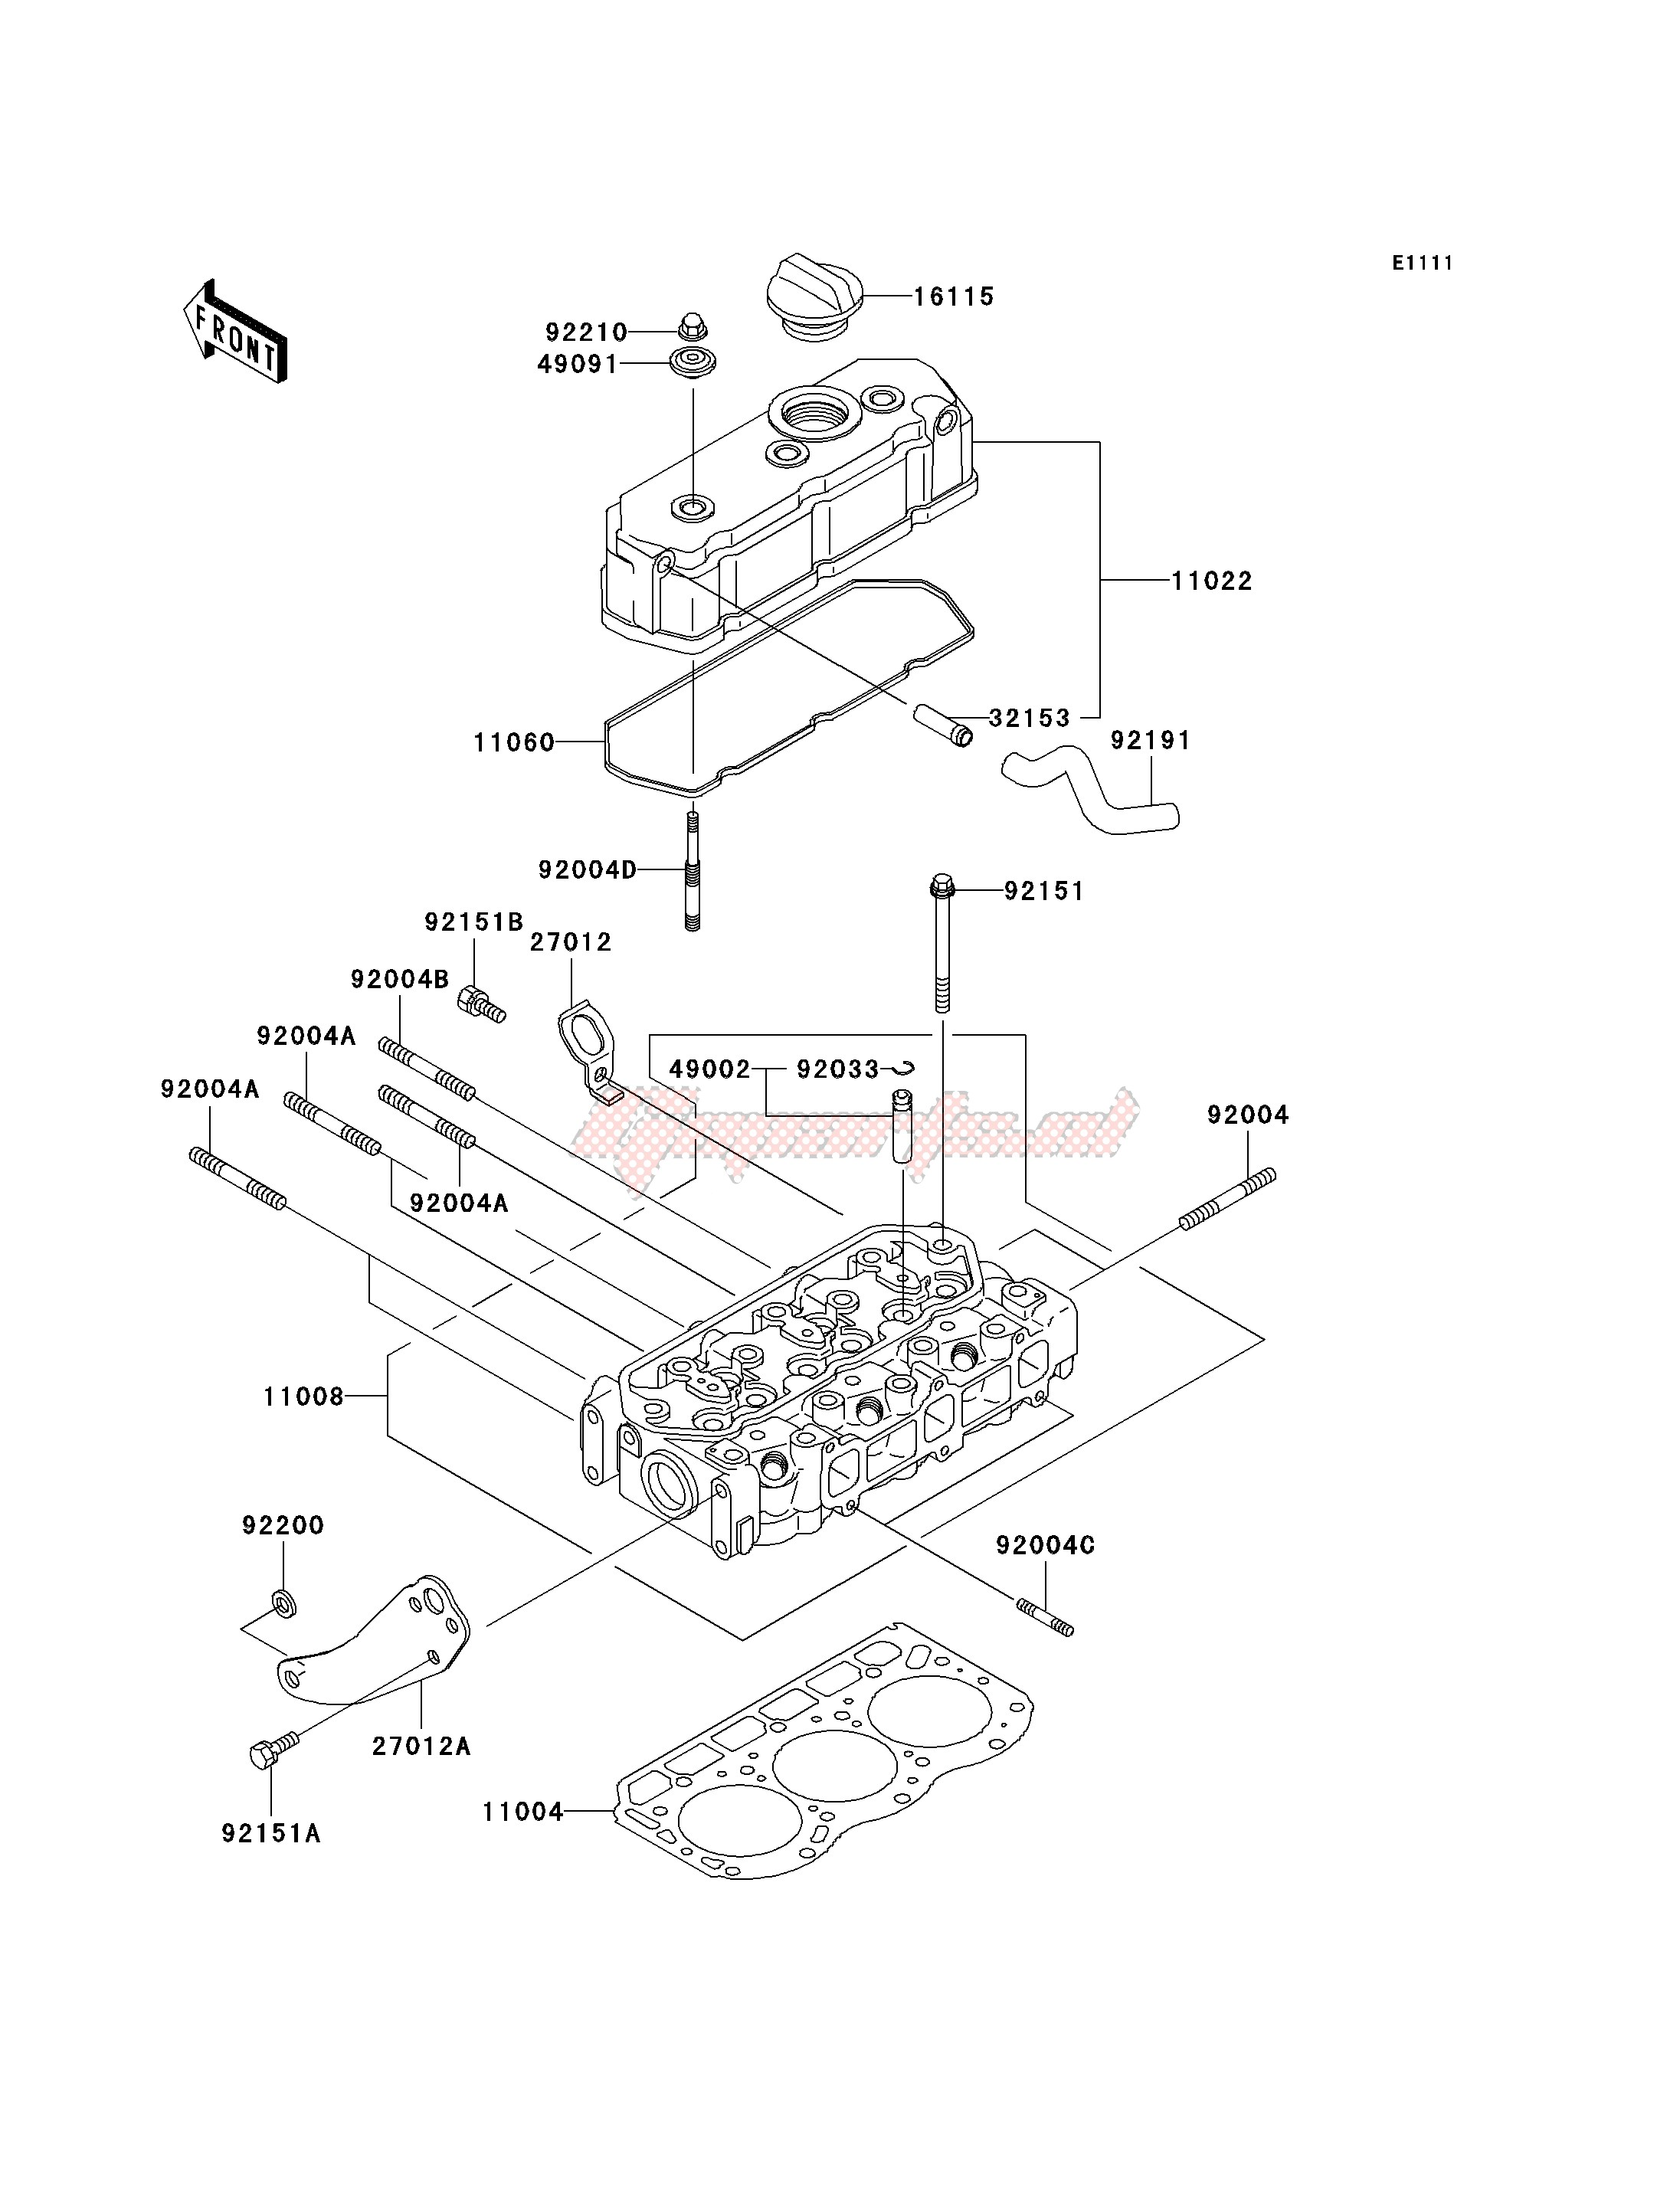 OEM parts Kawasaki [All terrain] KAF 950 B [MULE 3010